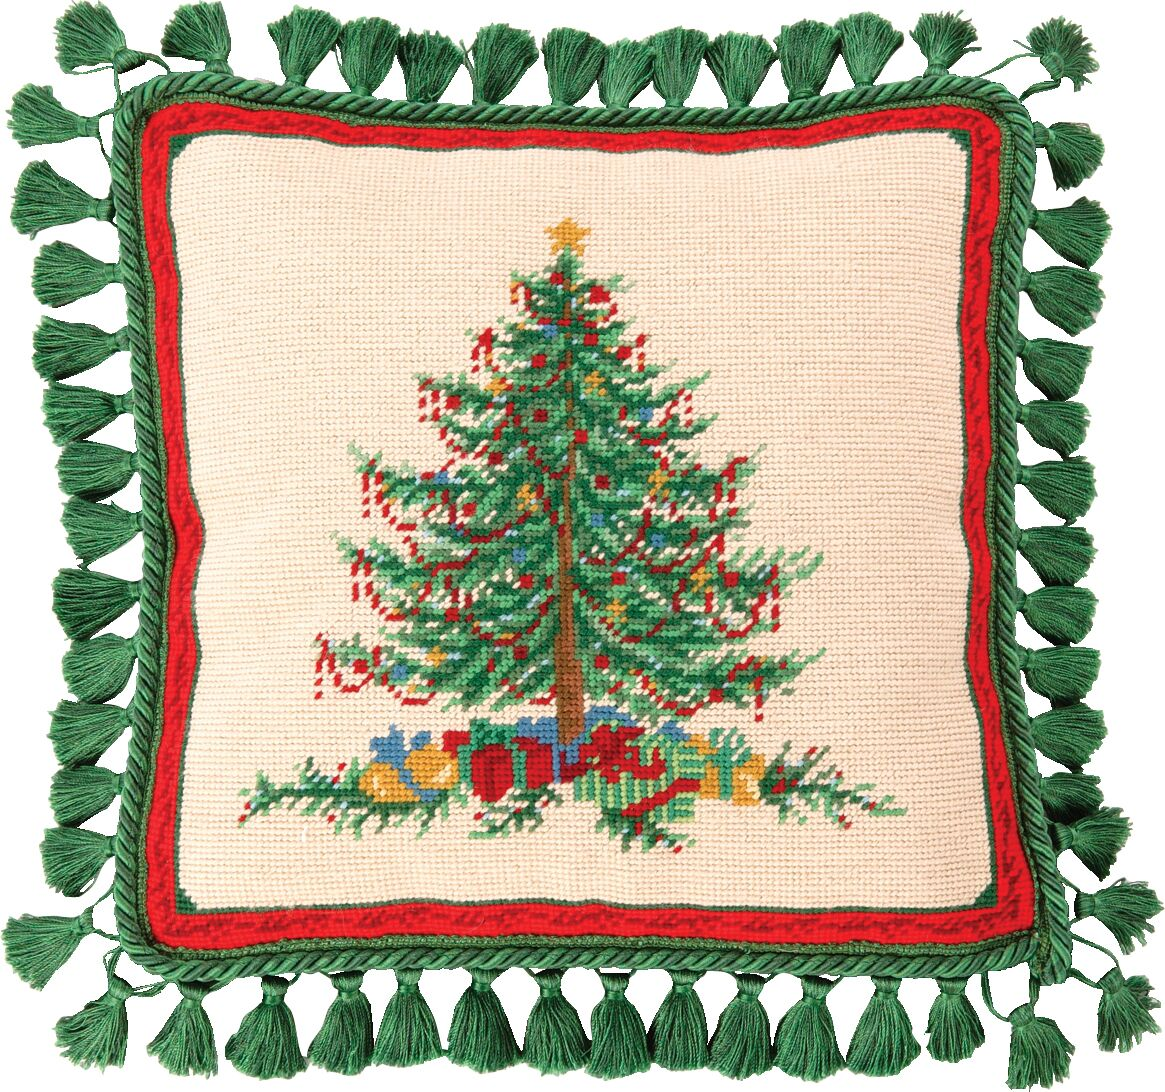 Needlepoint Classic Christmas Wool Throw Pillow